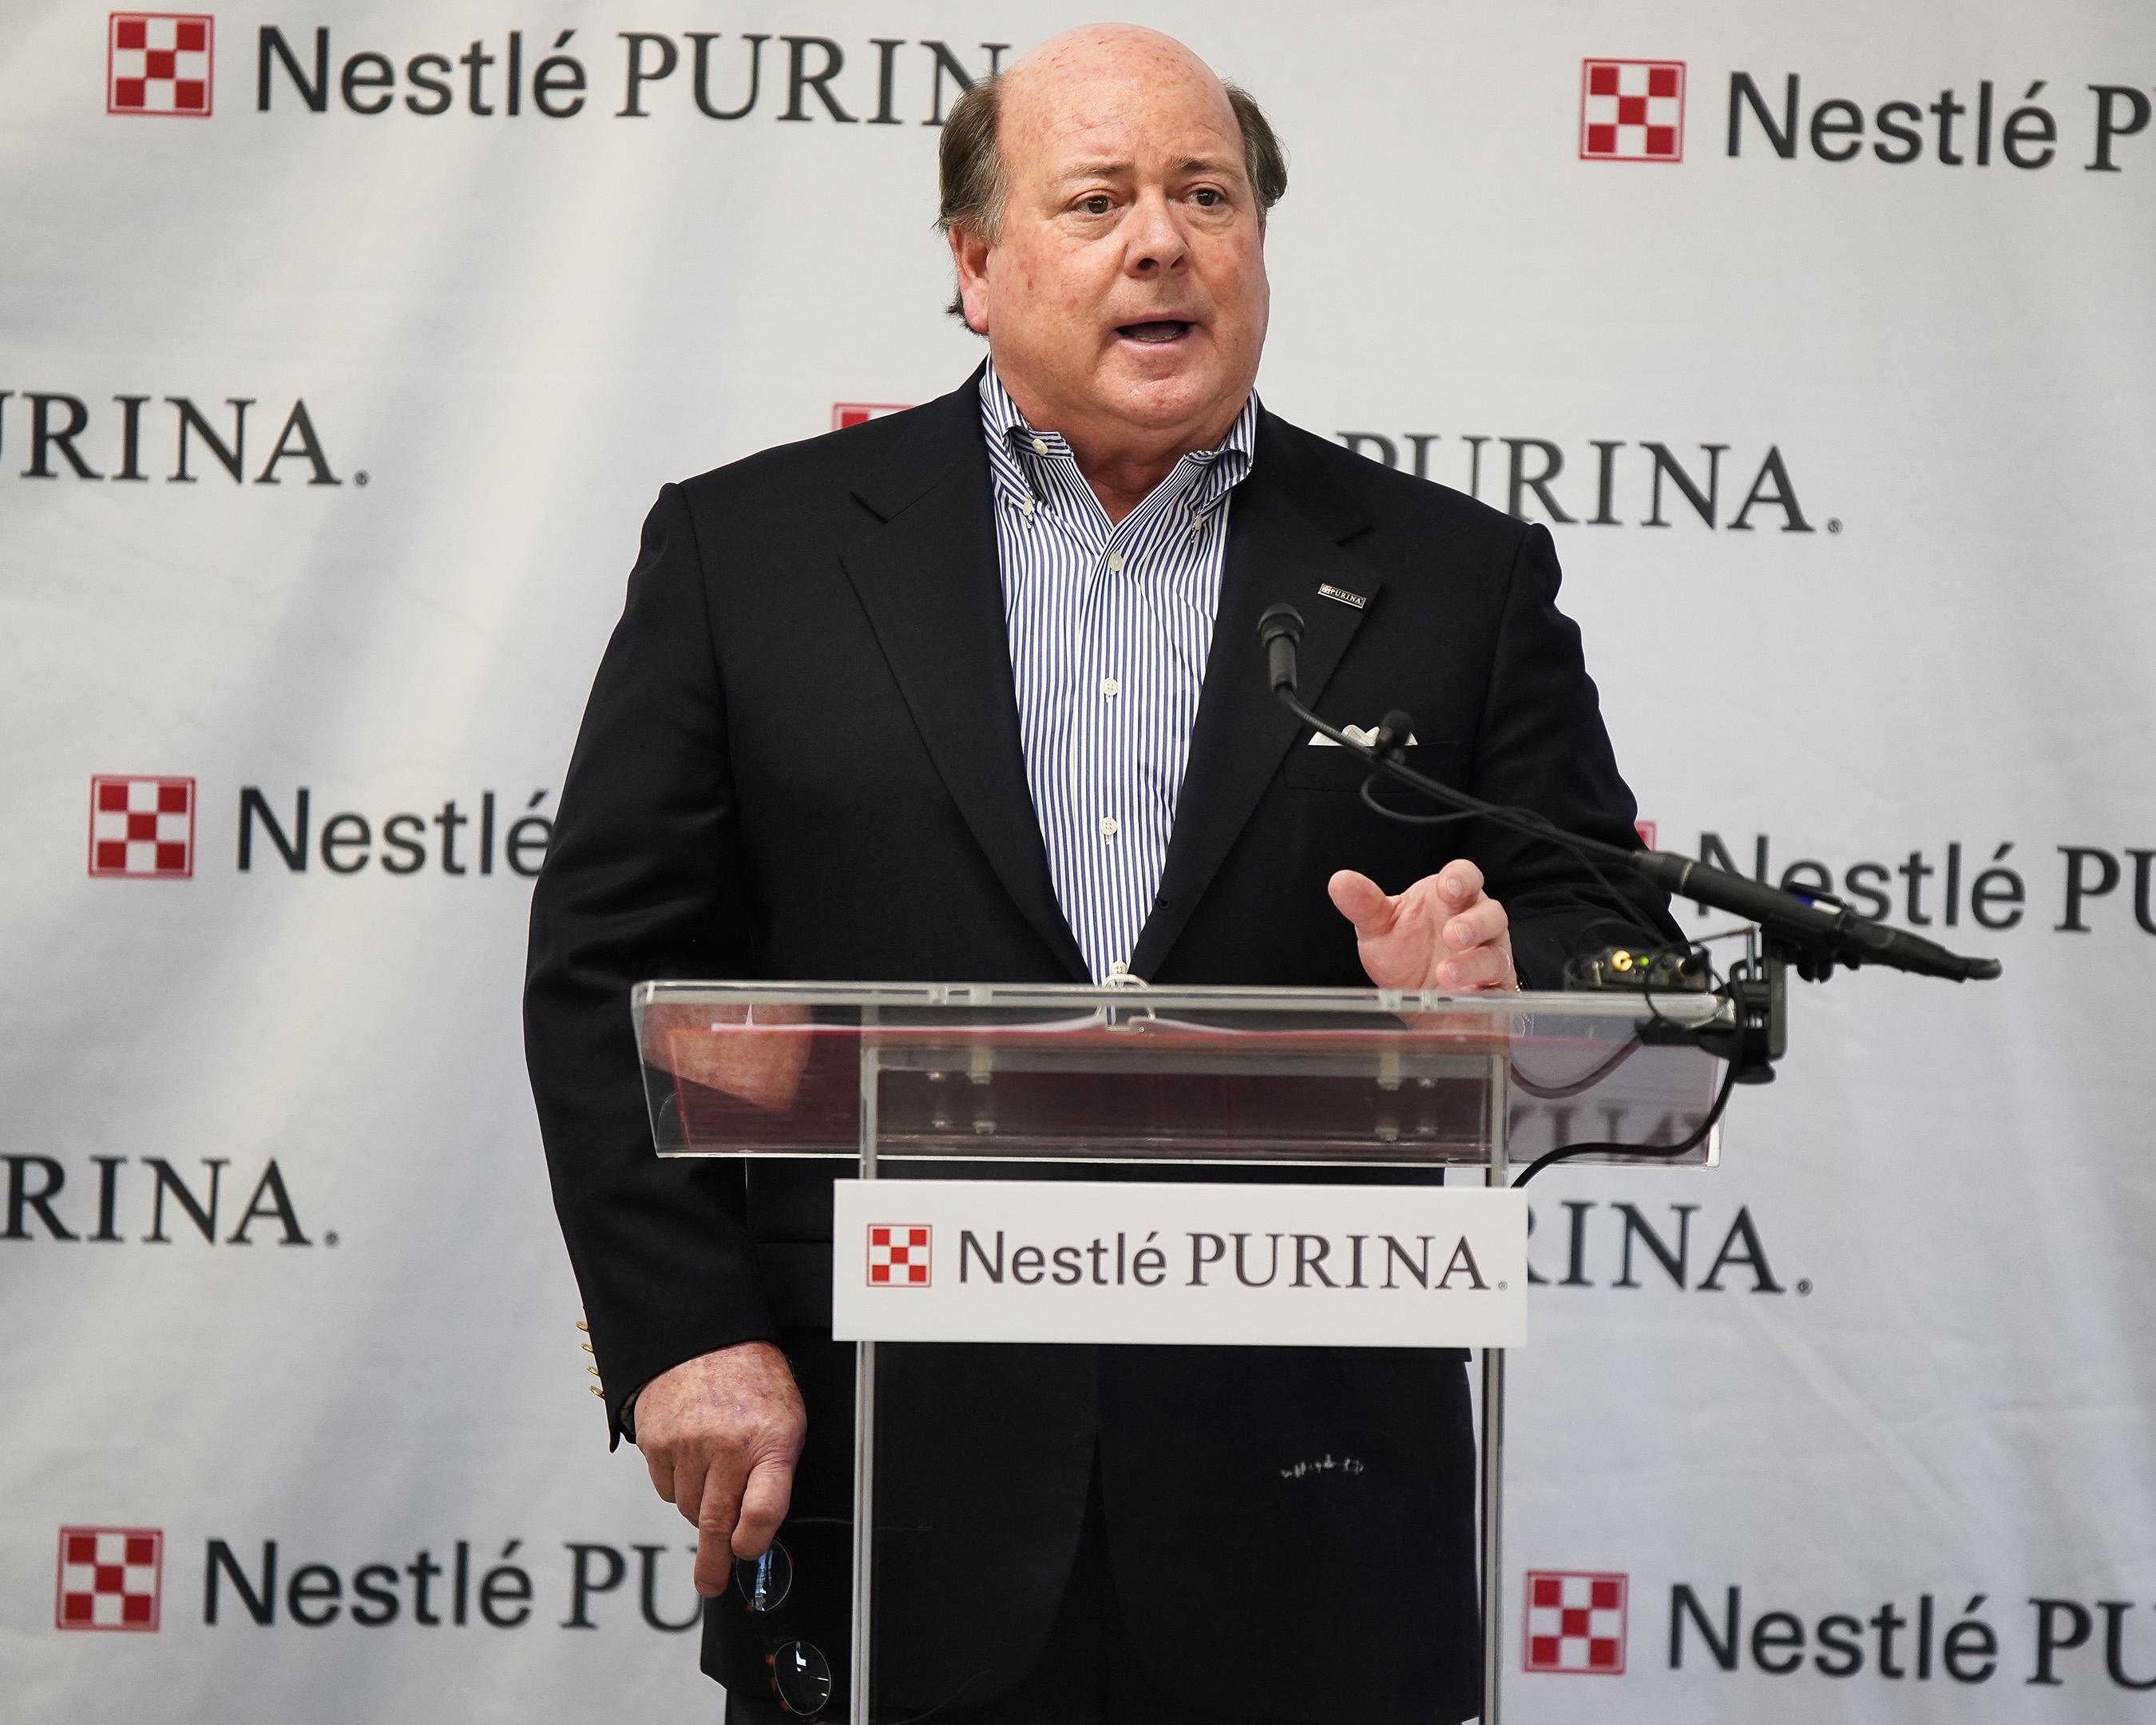 Purina CEO Joseph Sivewright